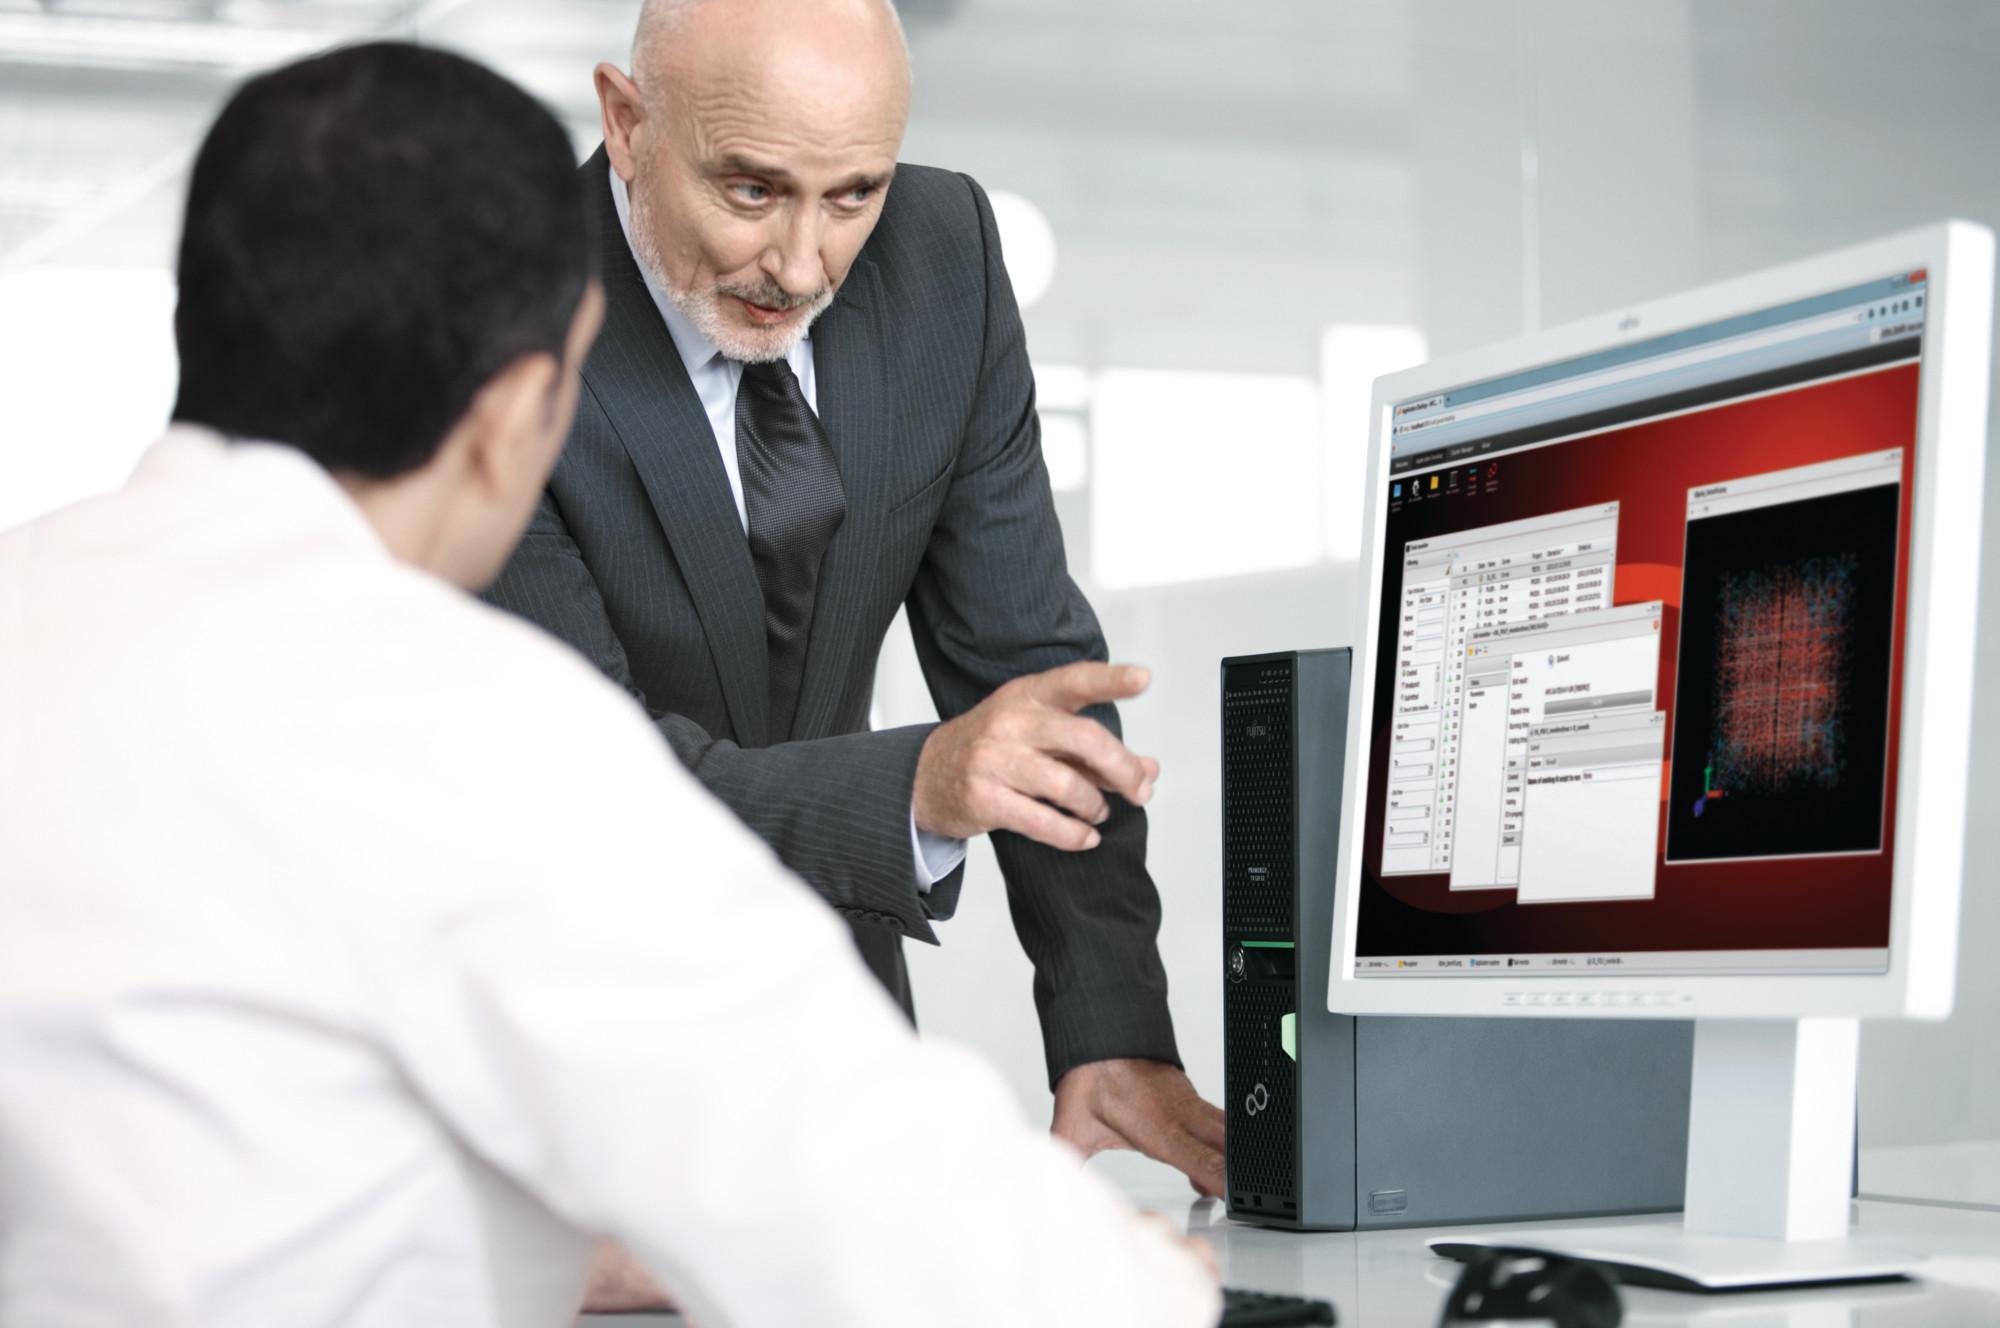 Main visual : Thinking high-performance computing for your SMB? Think FUJITSU PRIMERGY server graphics cards